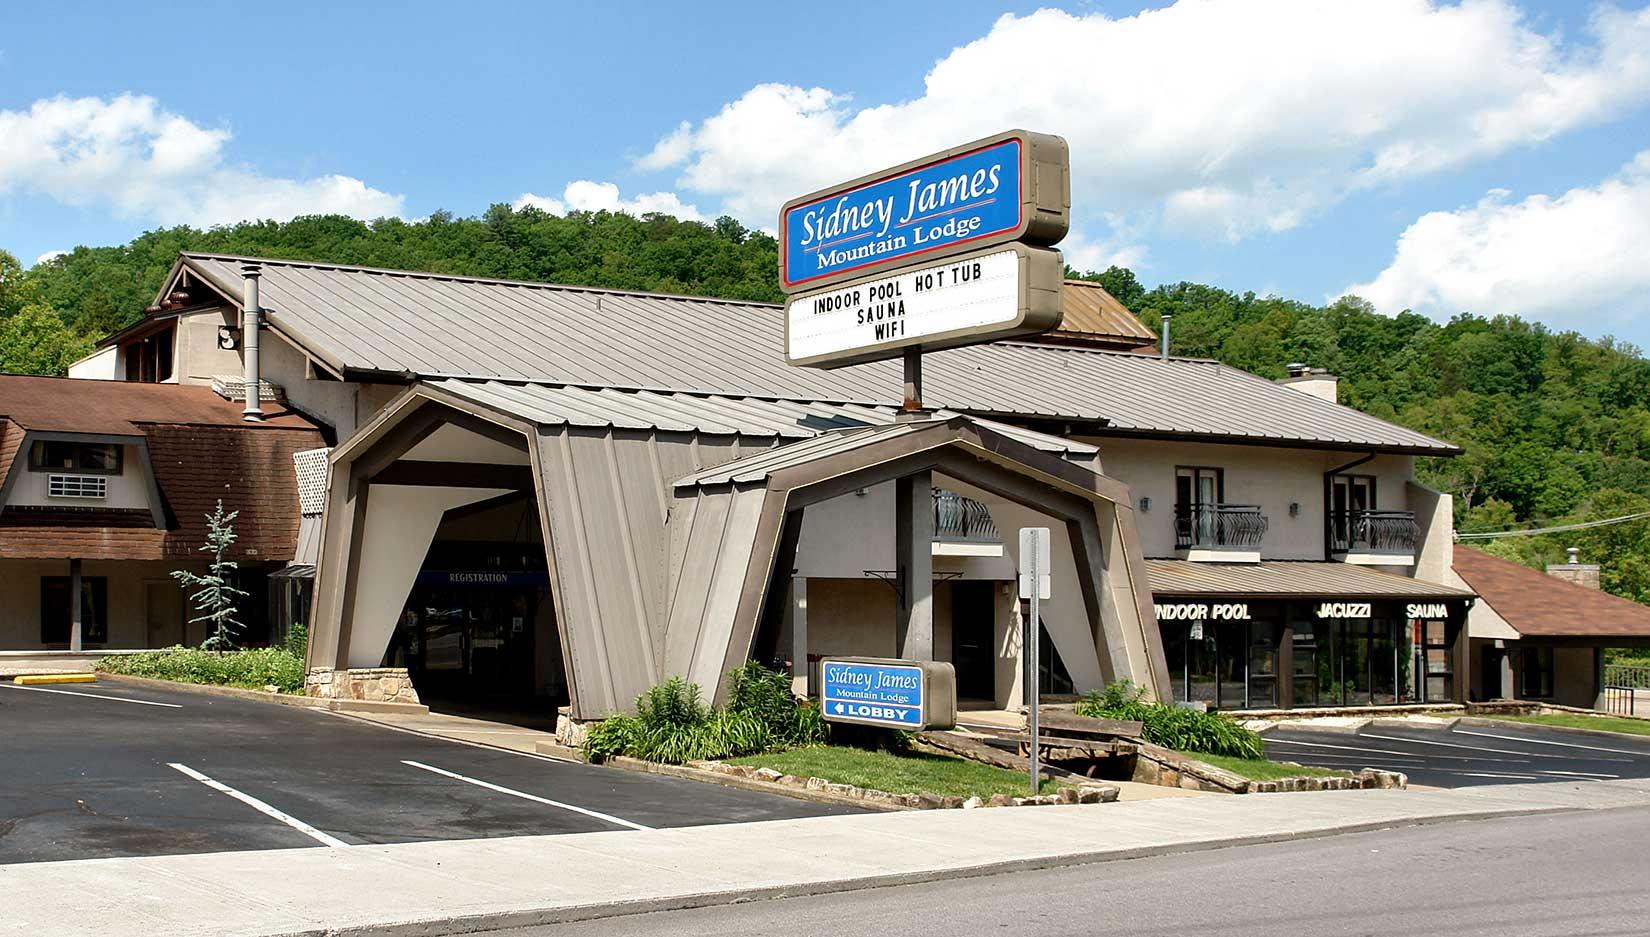 Sidney James Mountain Lodge image 0